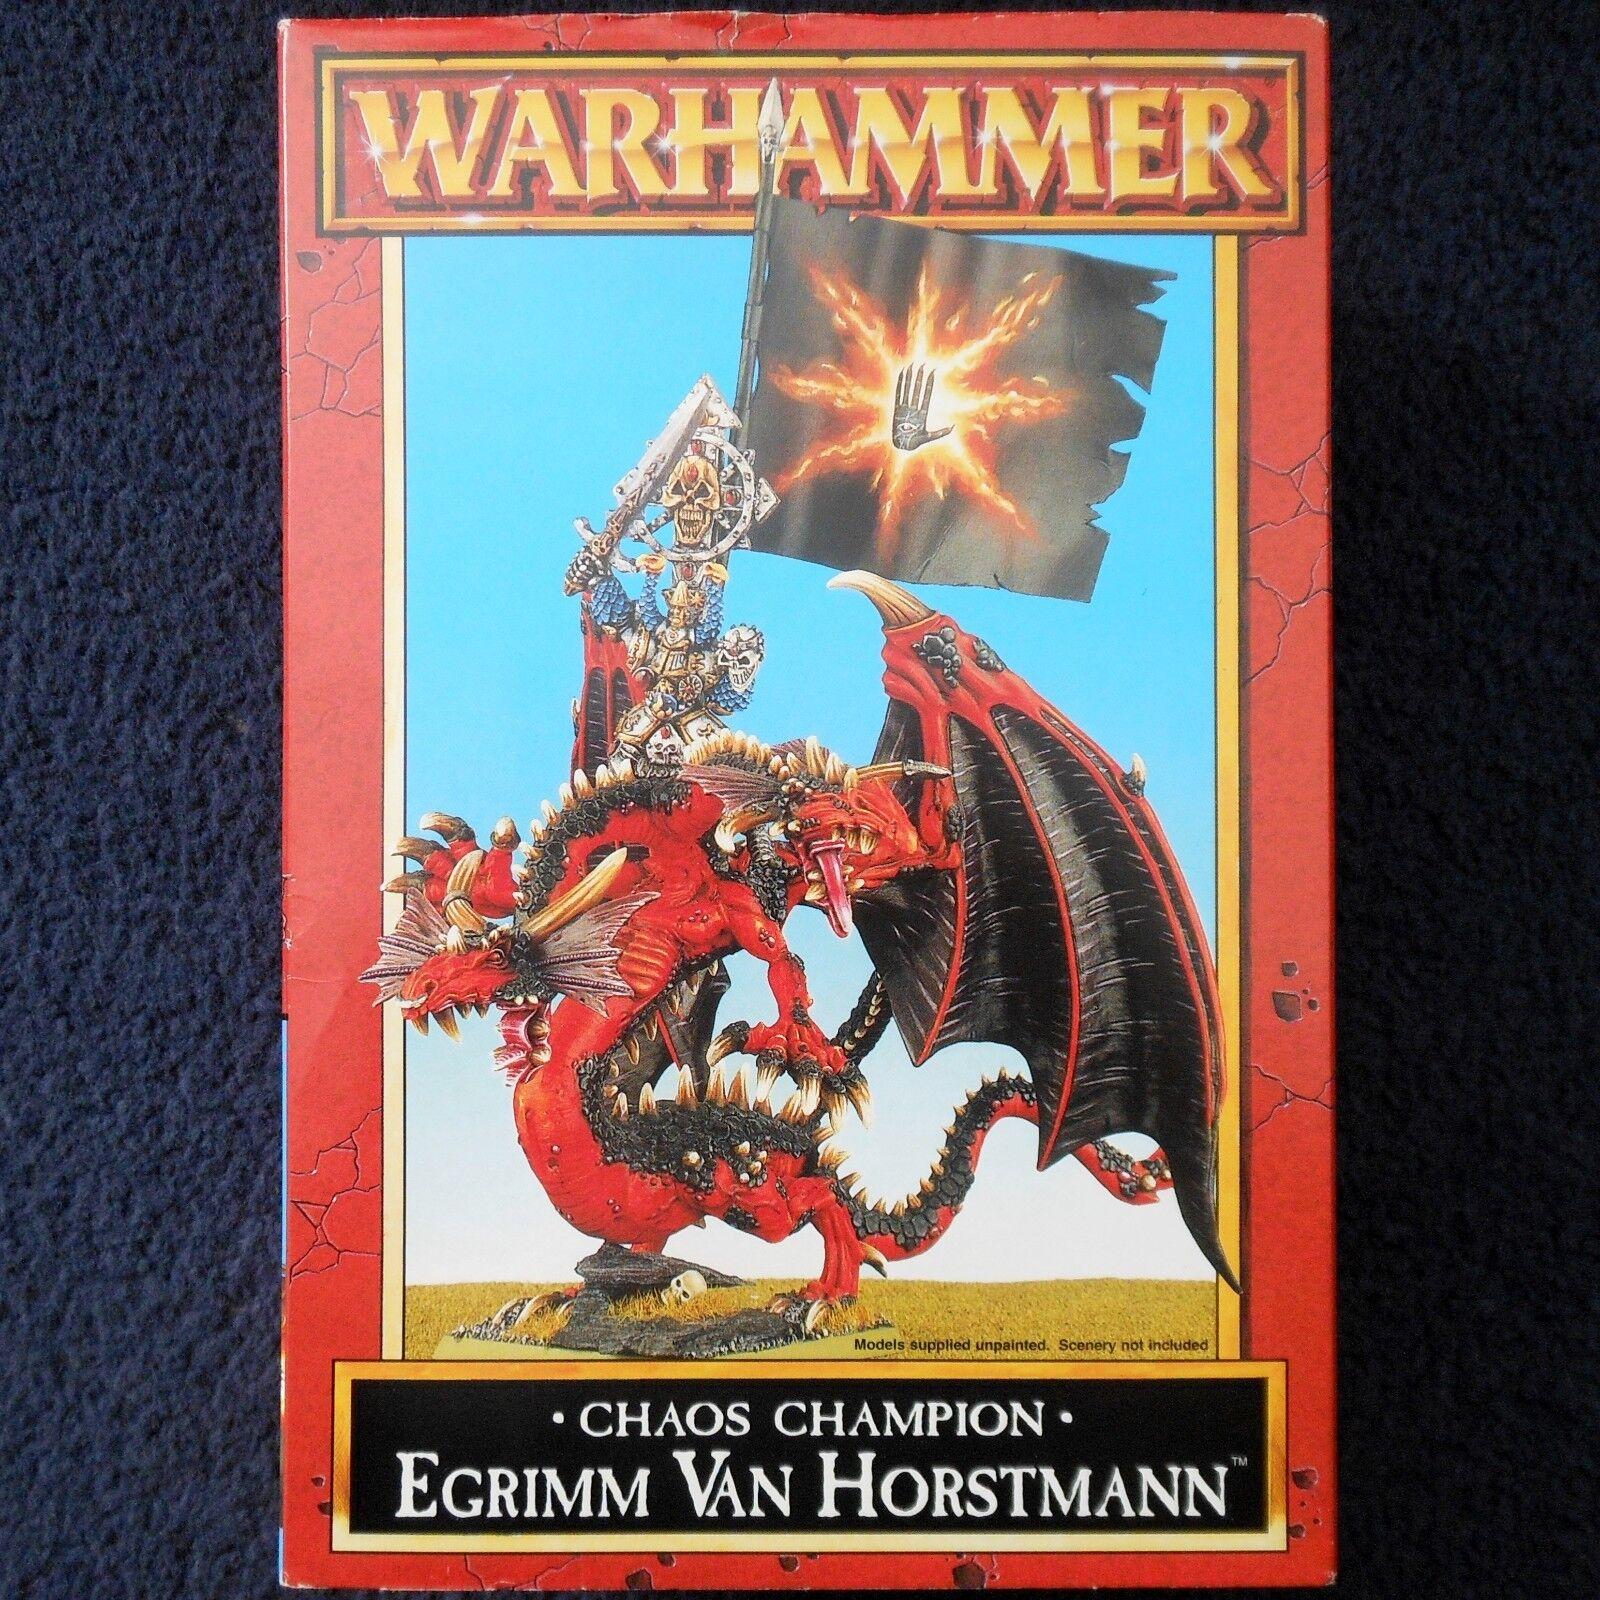 1995 Egrimm Van Horstmann Dark Sorcerer Of Chaos Dungeons & Dragons Citadel MIB